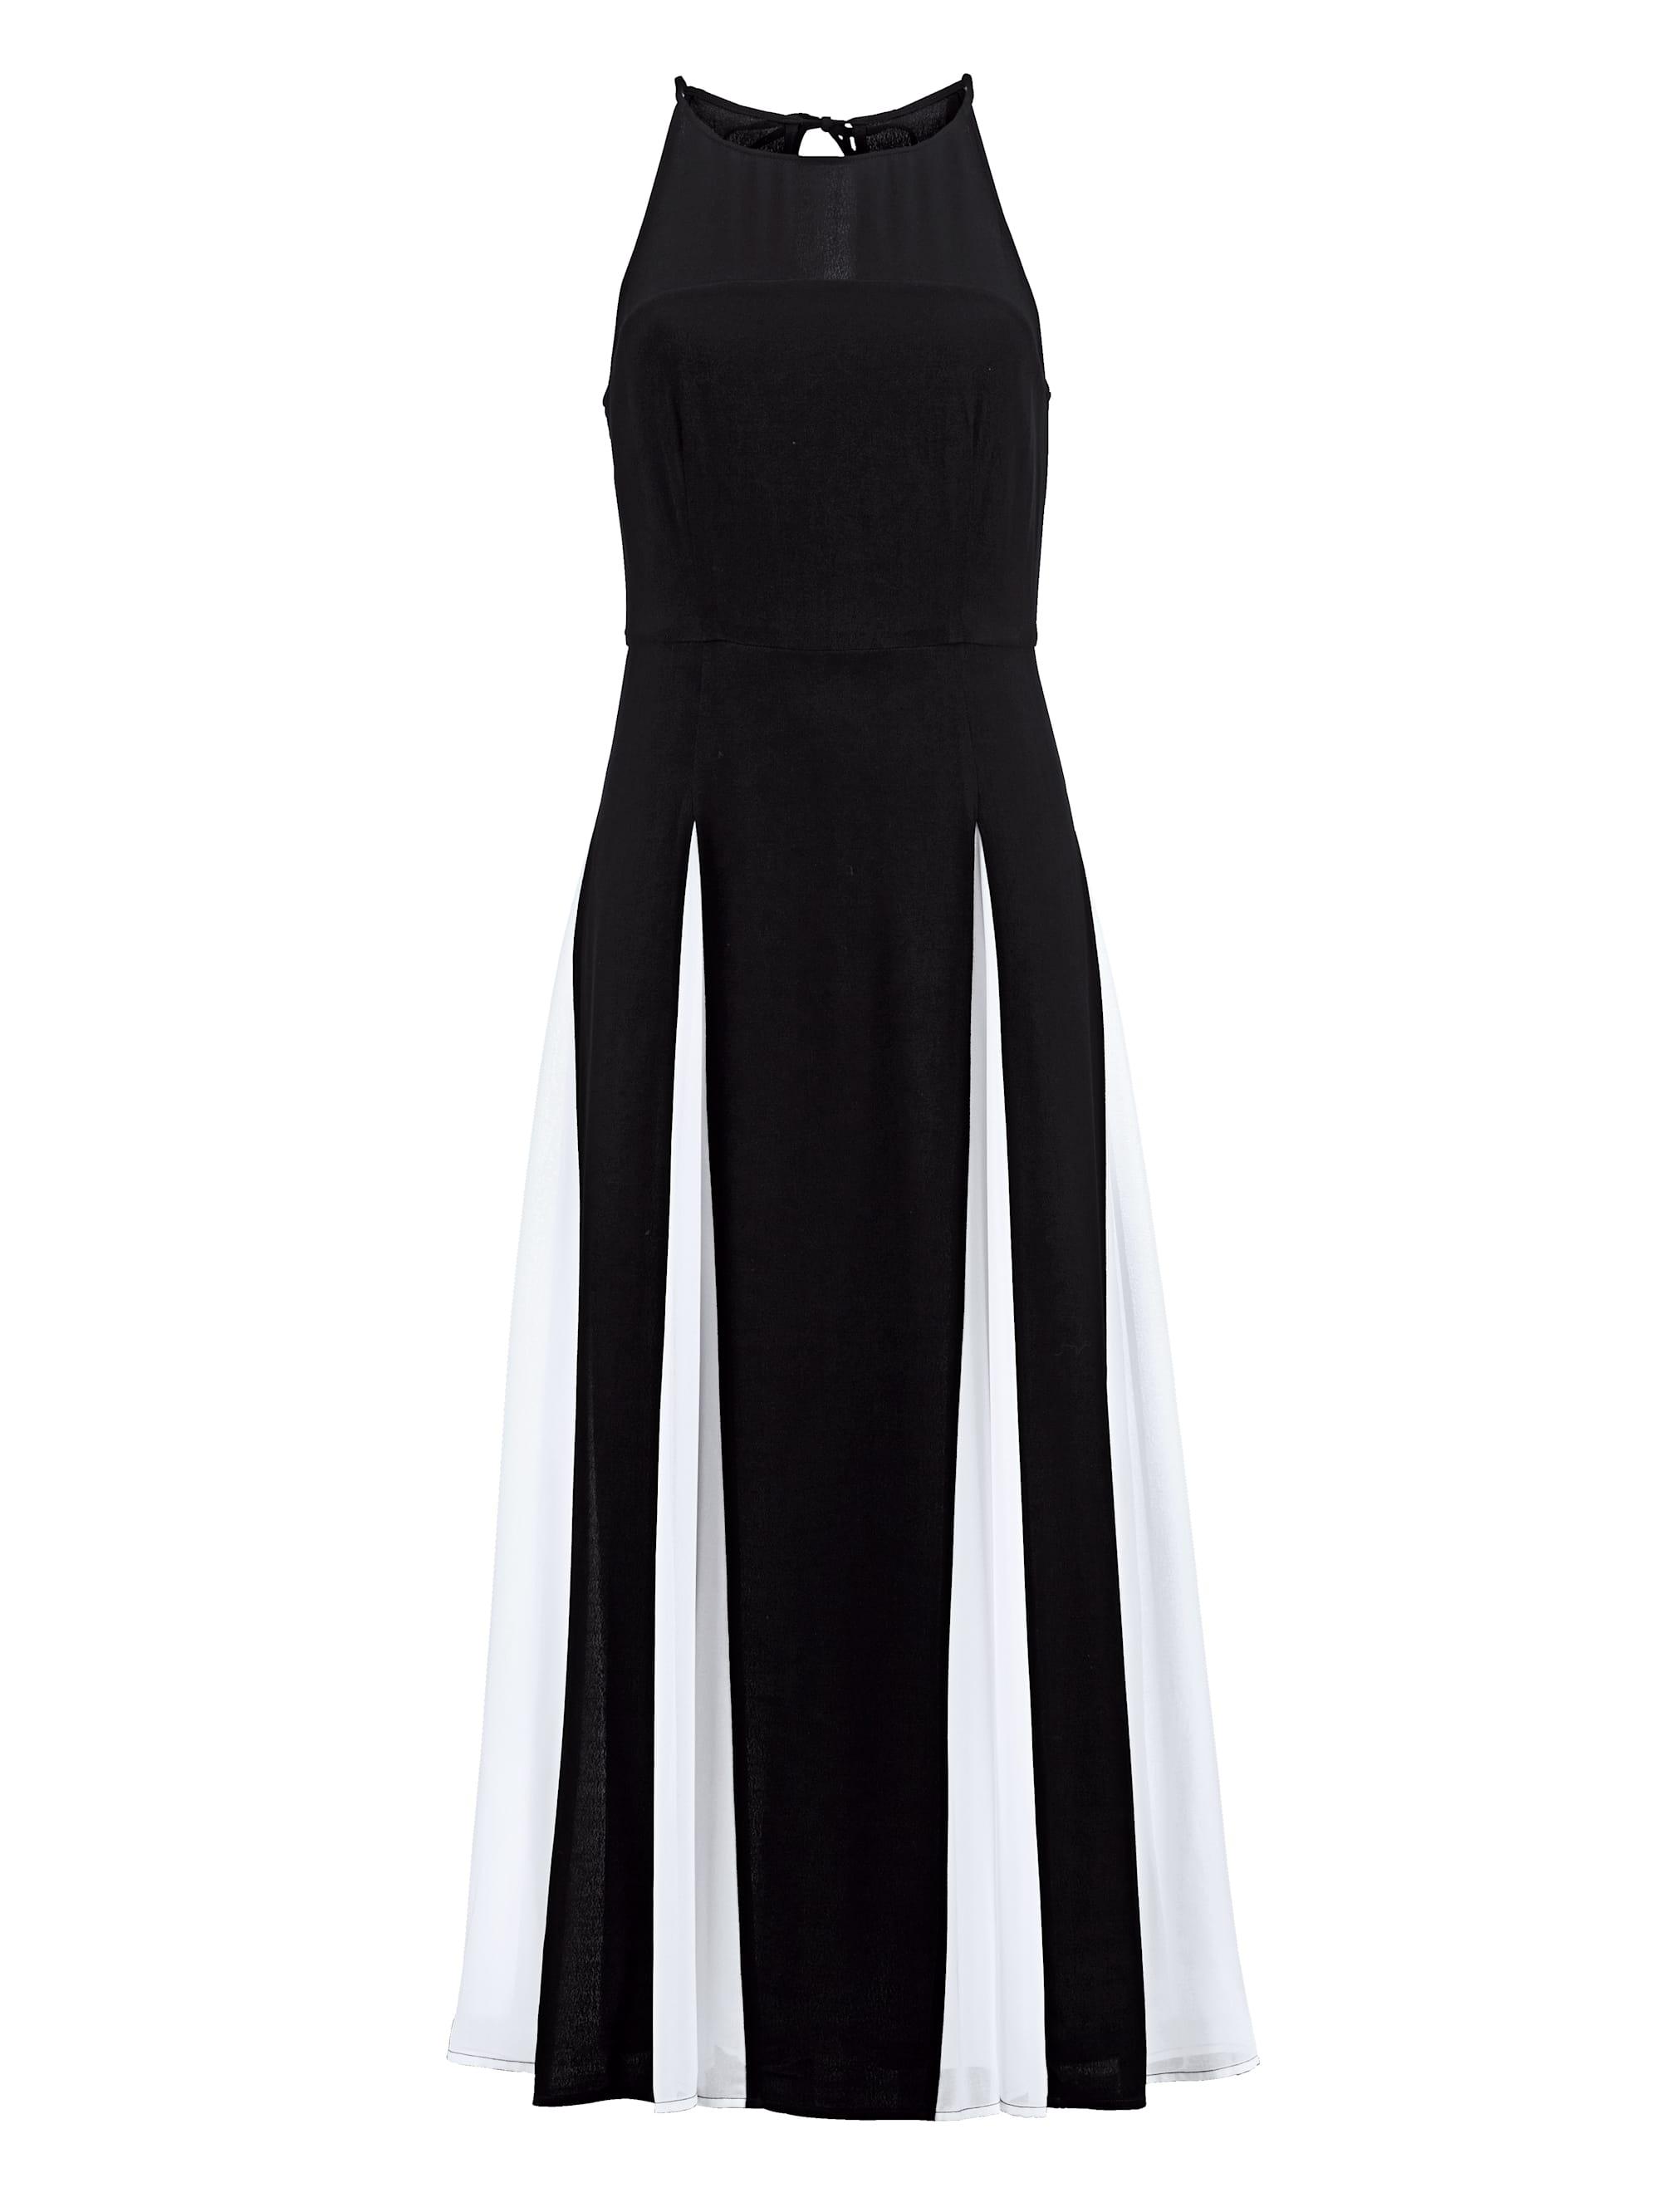 Alba Moda Chiffon-Kleid in Two-Tone-Optik 4wG6J 65pVO